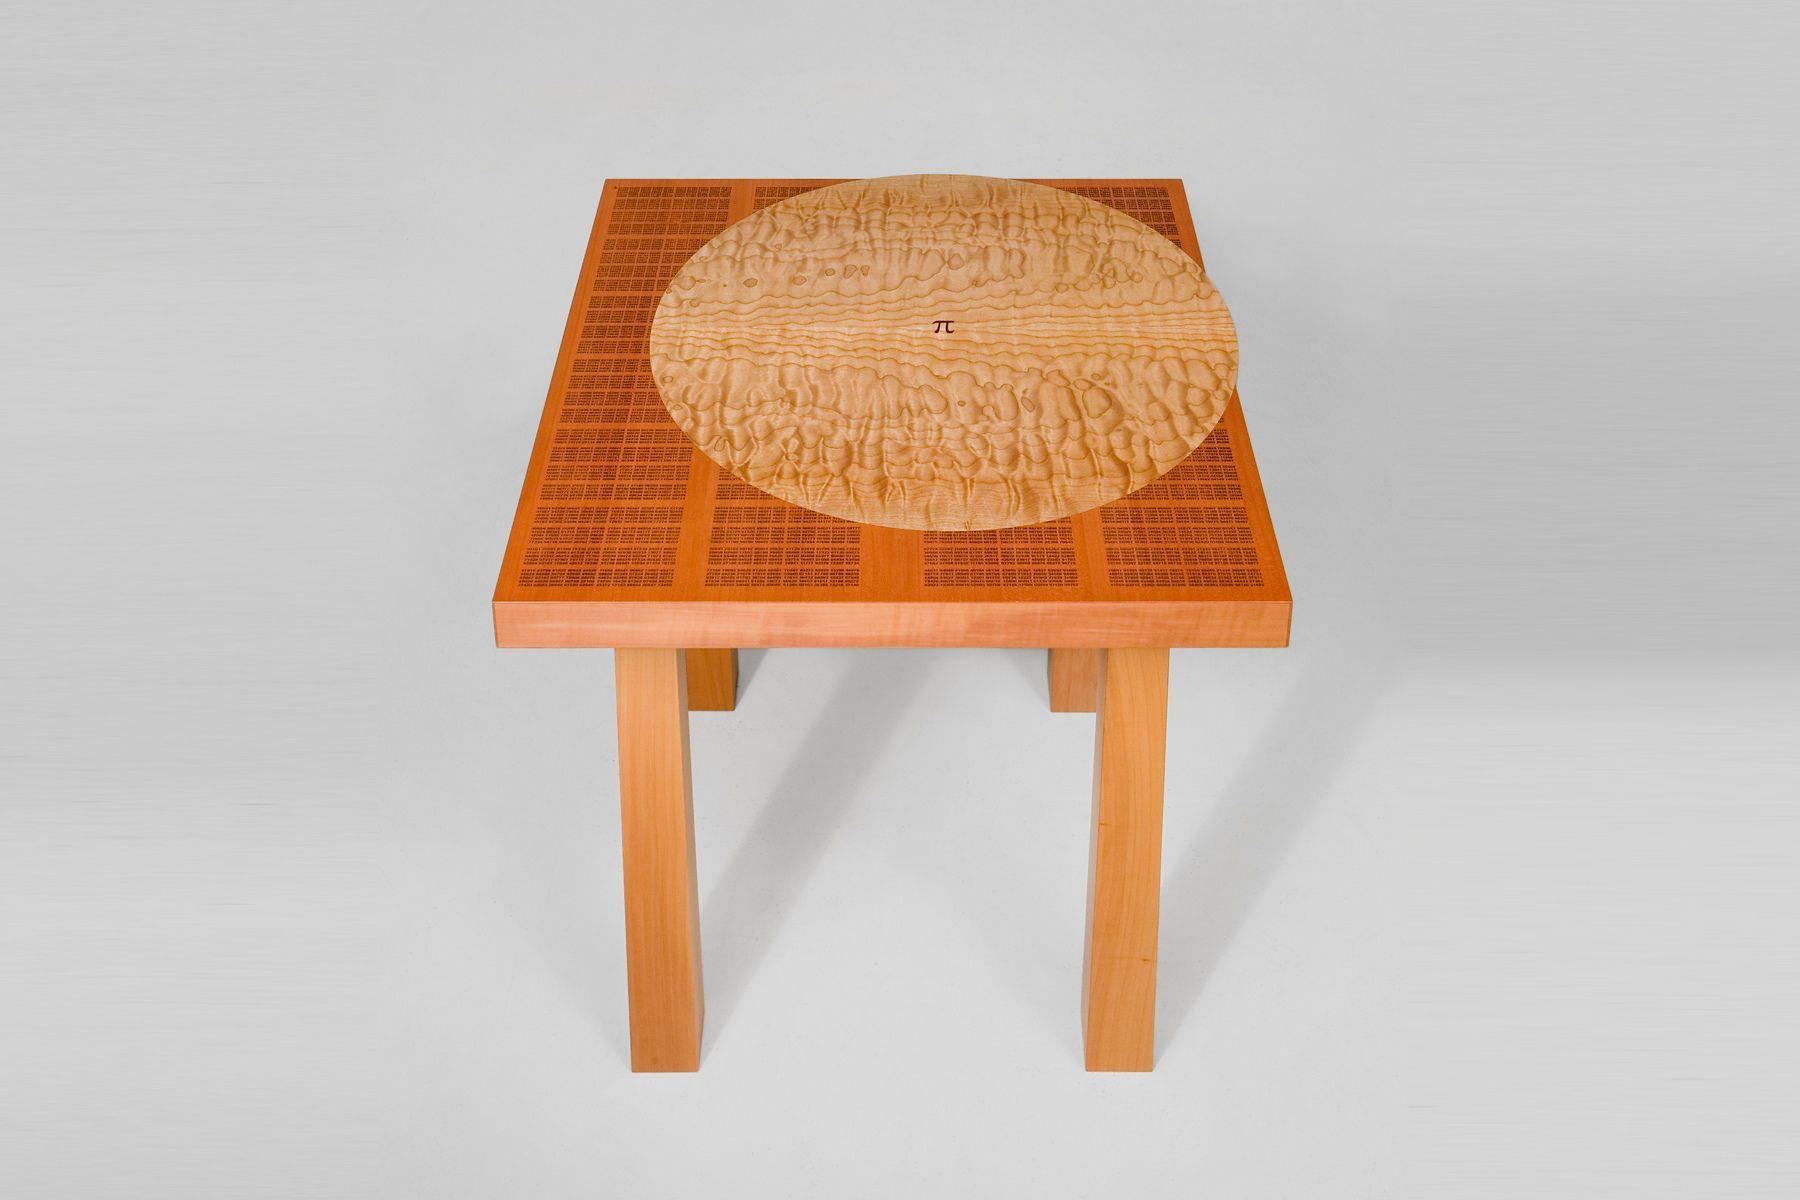 1aaron_levine_contemporary_modern_studio_furniture_maker_wood_woodworker_art_artist_northwest_parquetry_decorative_mathematical_pi_table_detail2.jpg